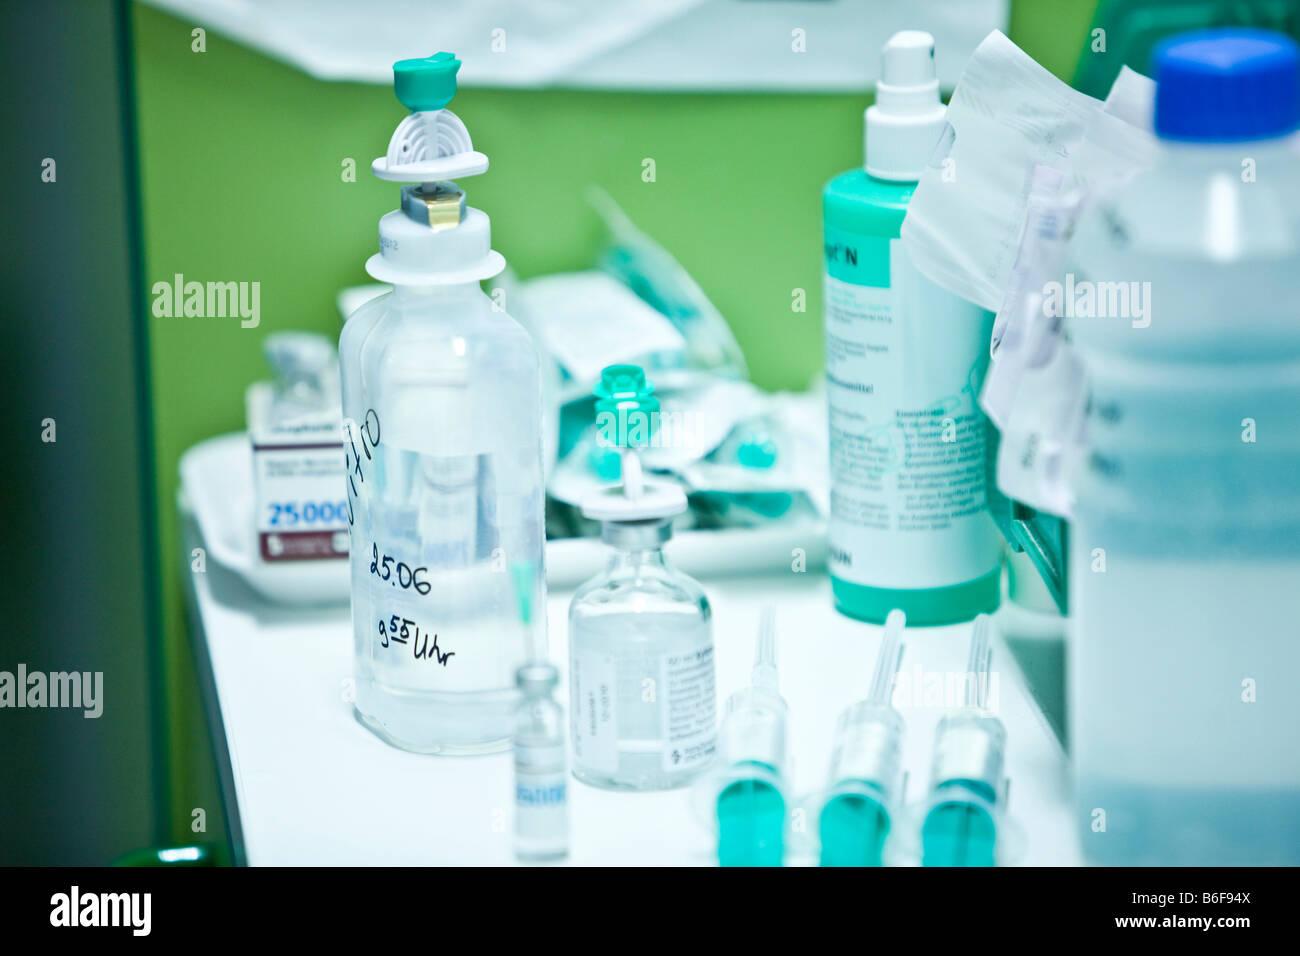 Operating room paraphernalia in a hospital Stock Photo